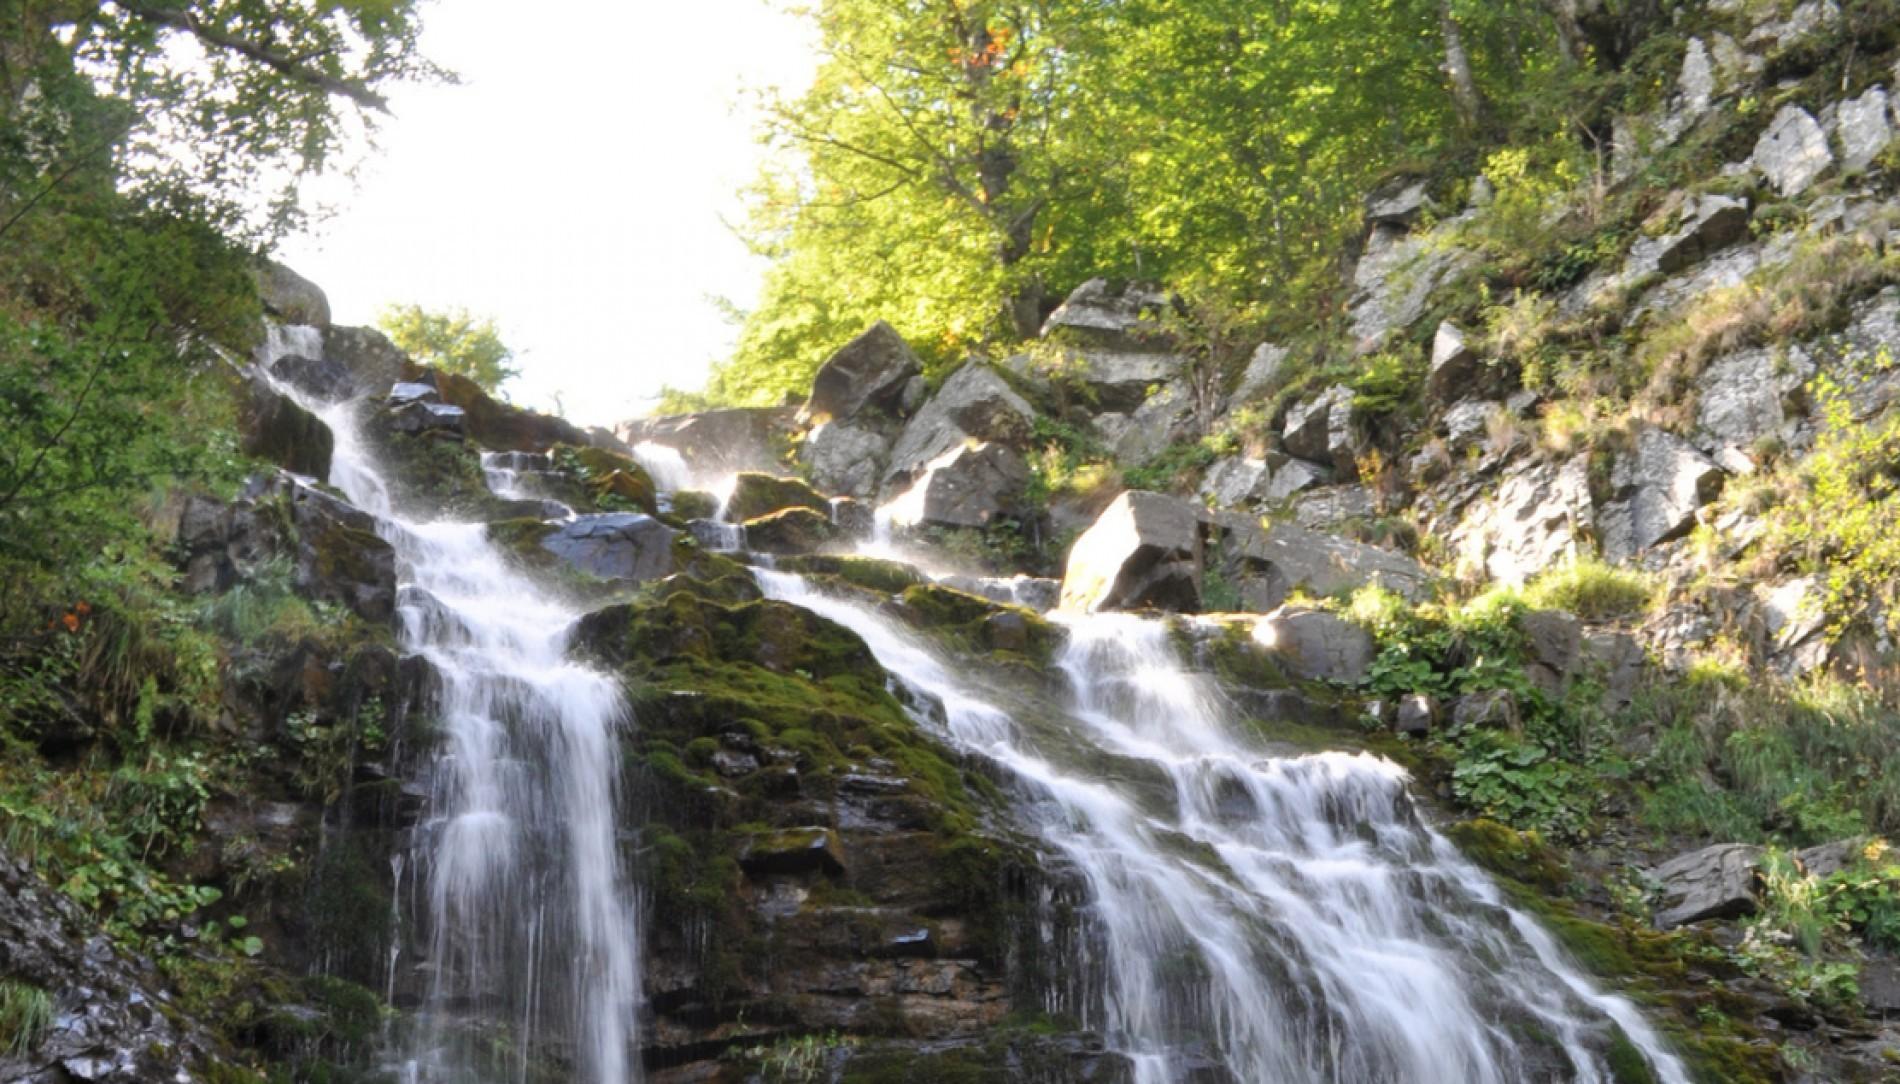 WATERFALLS: SECRET TREASURES TO DISCOVER